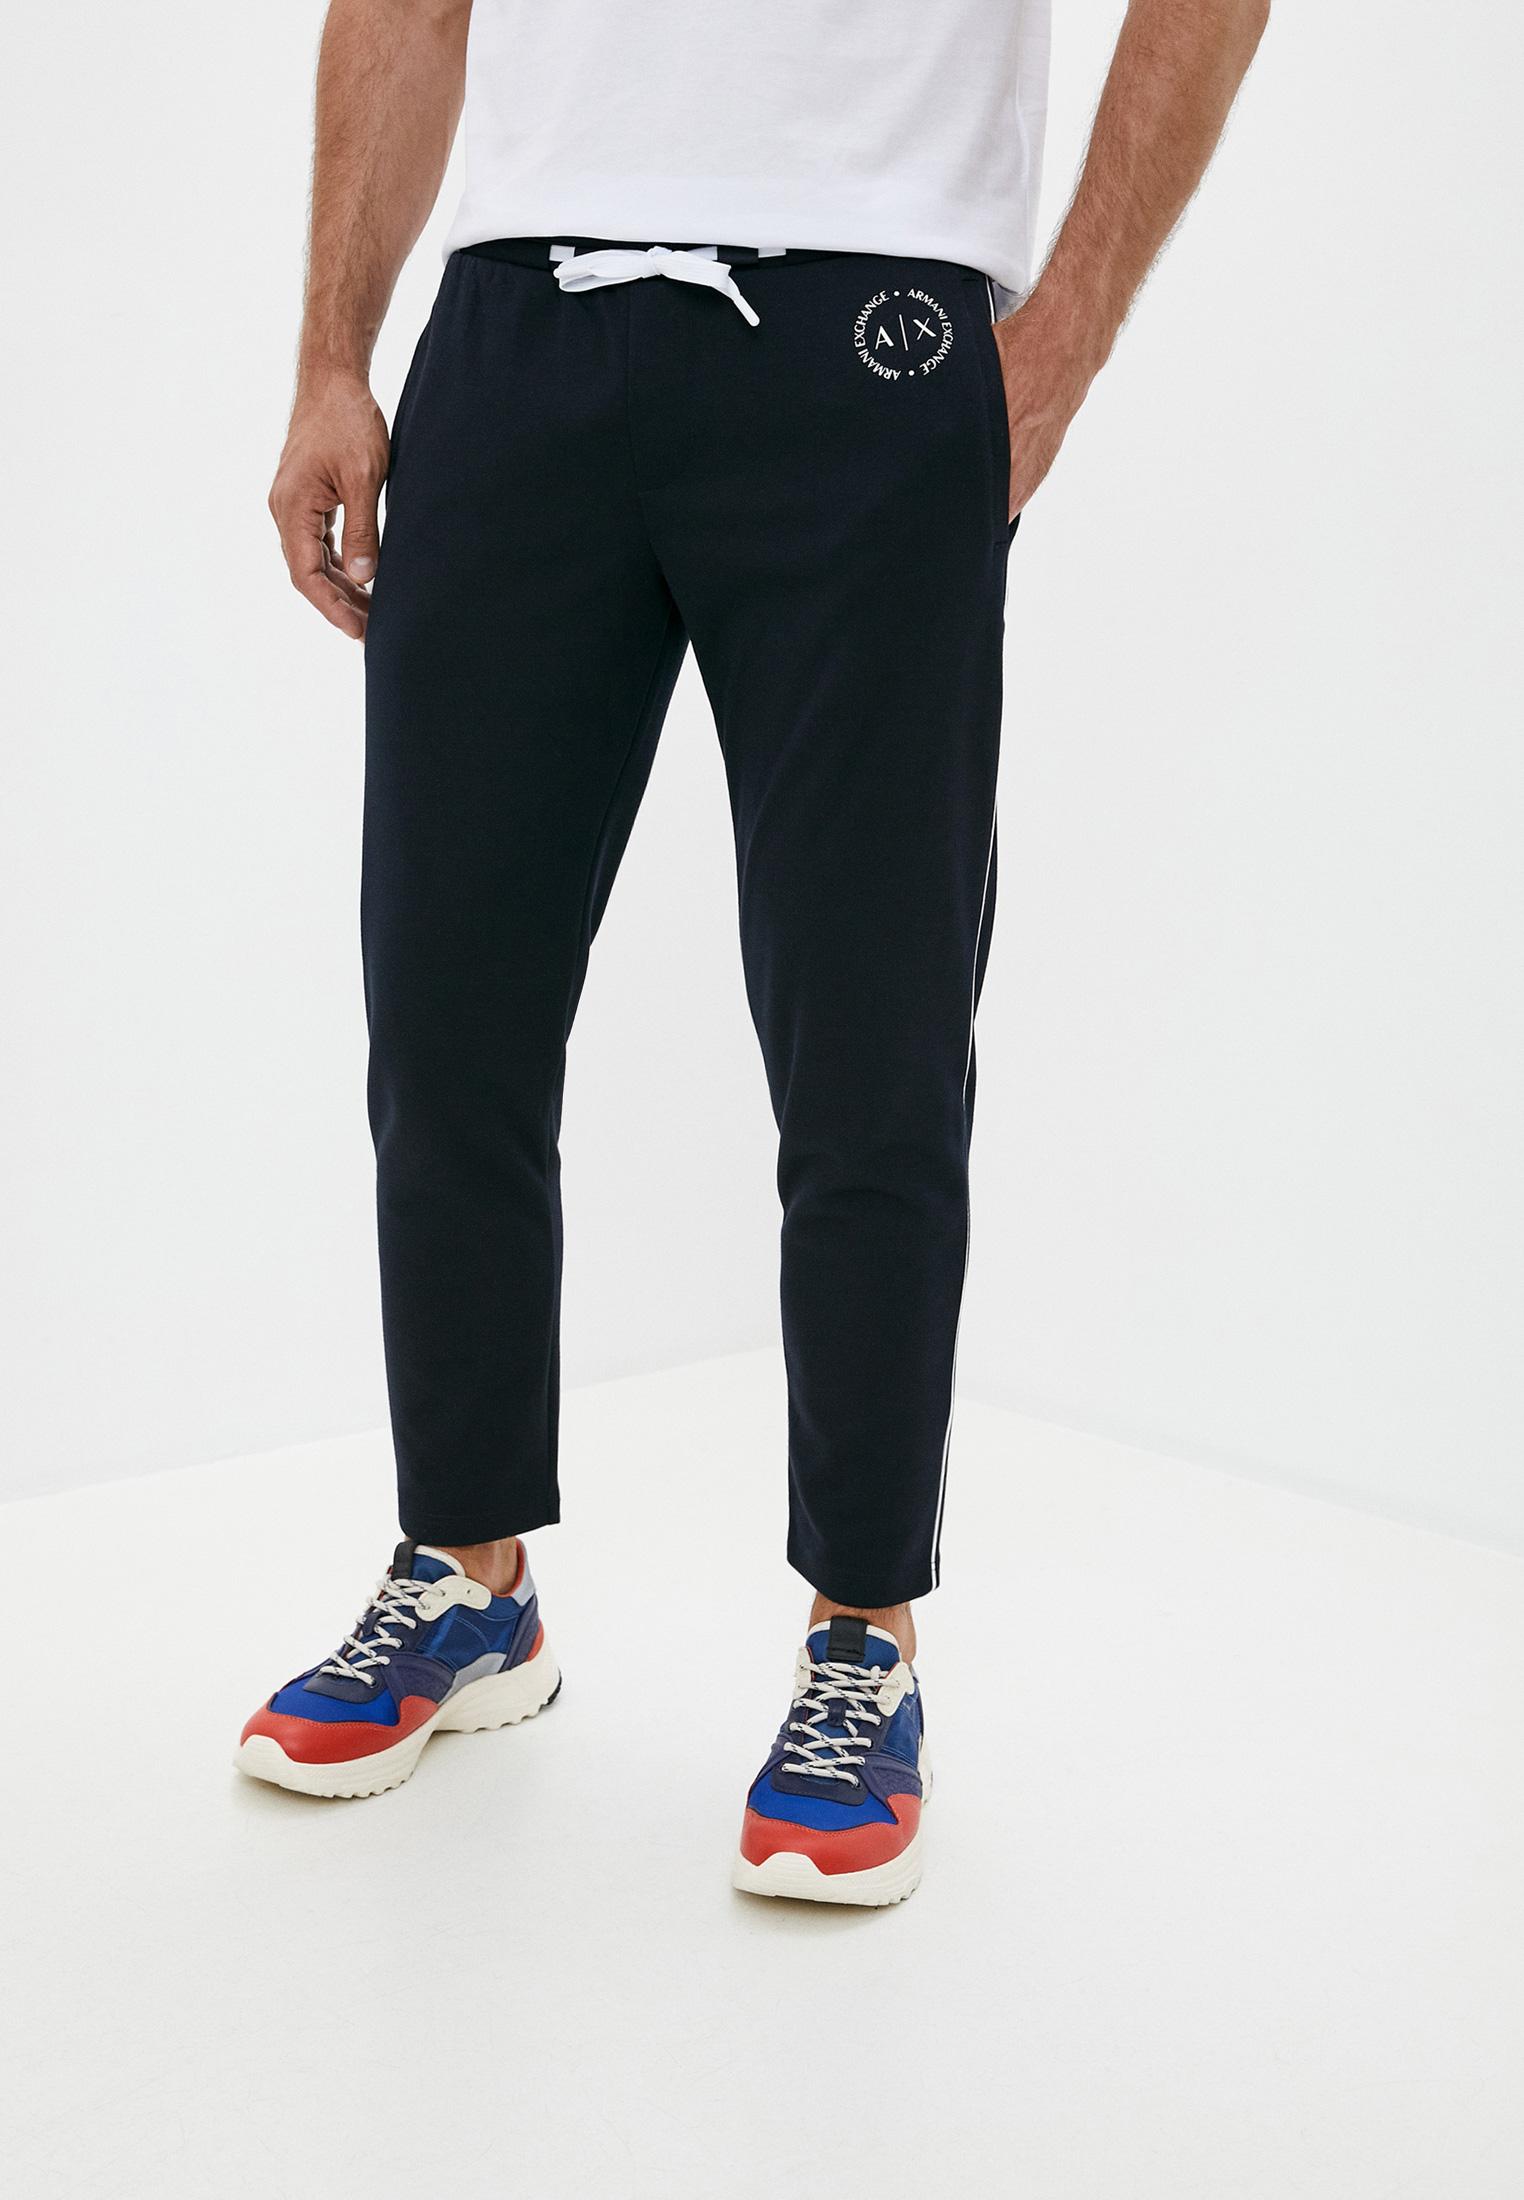 Мужские спортивные брюки Armani Exchange 8nzp92 Z9N1Z